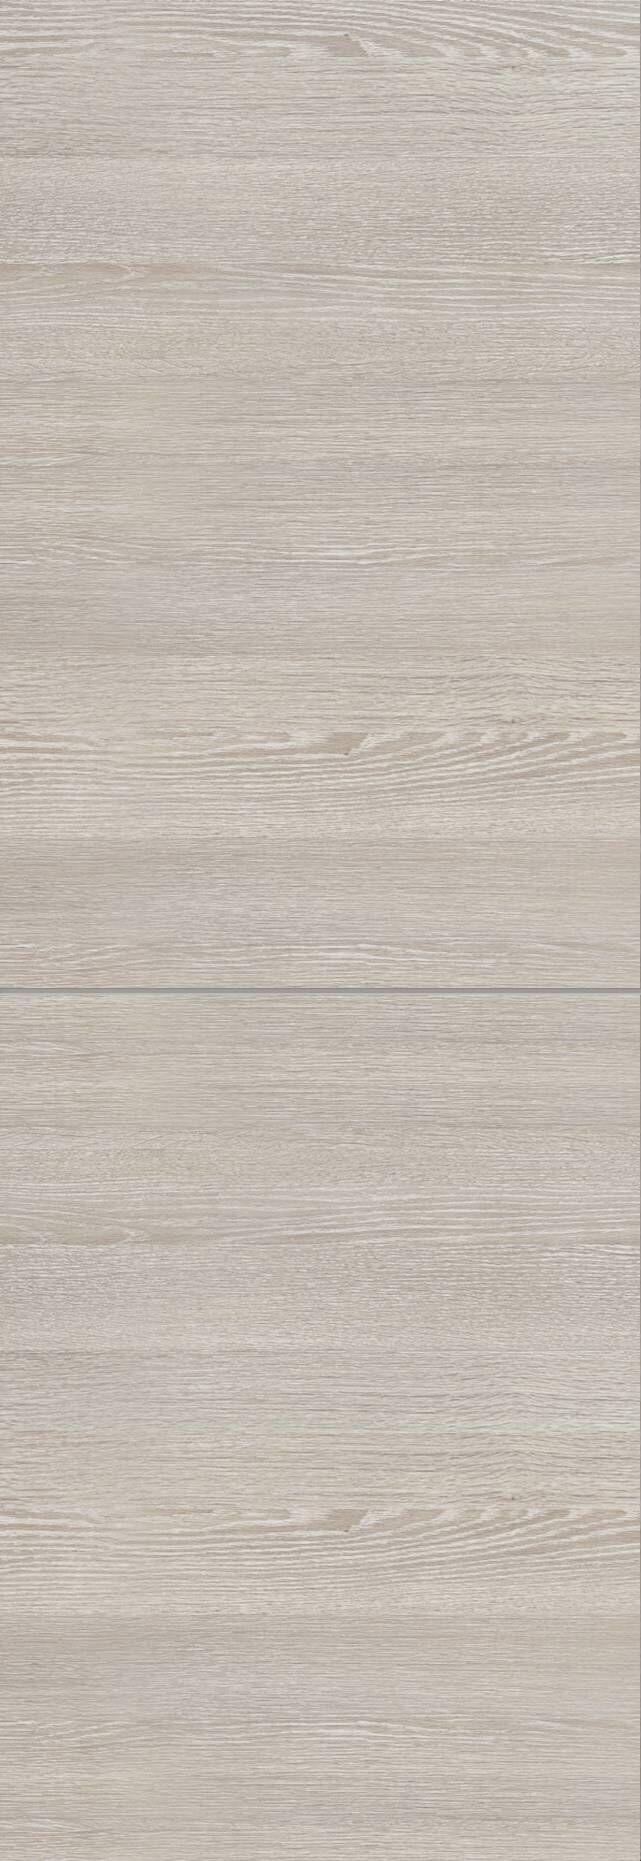 Tivoli Б-2 Invisible цвет - Серый дуб Без стекла (ДГ)